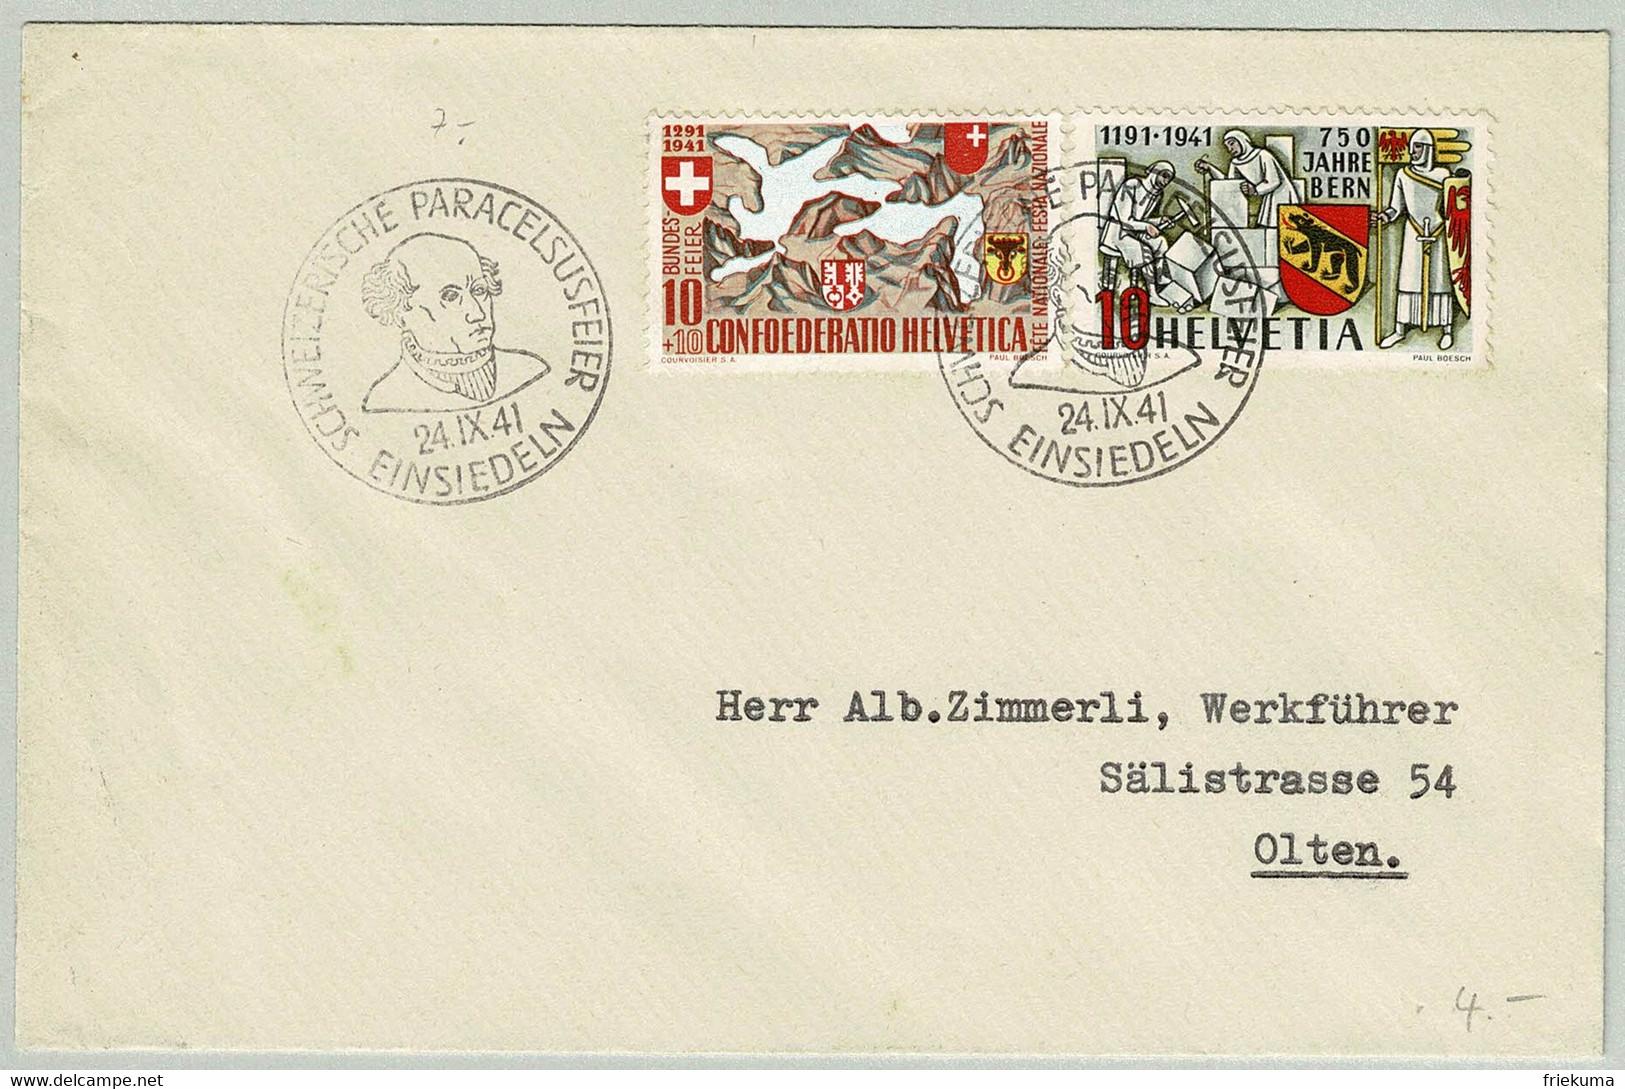 Schweiz / Helvetia 1941, Brief Paracelsus Feier Einsiedeln - Olten, Arzt / Médecin / Docteur, See / Lac / Sea - Unclassified